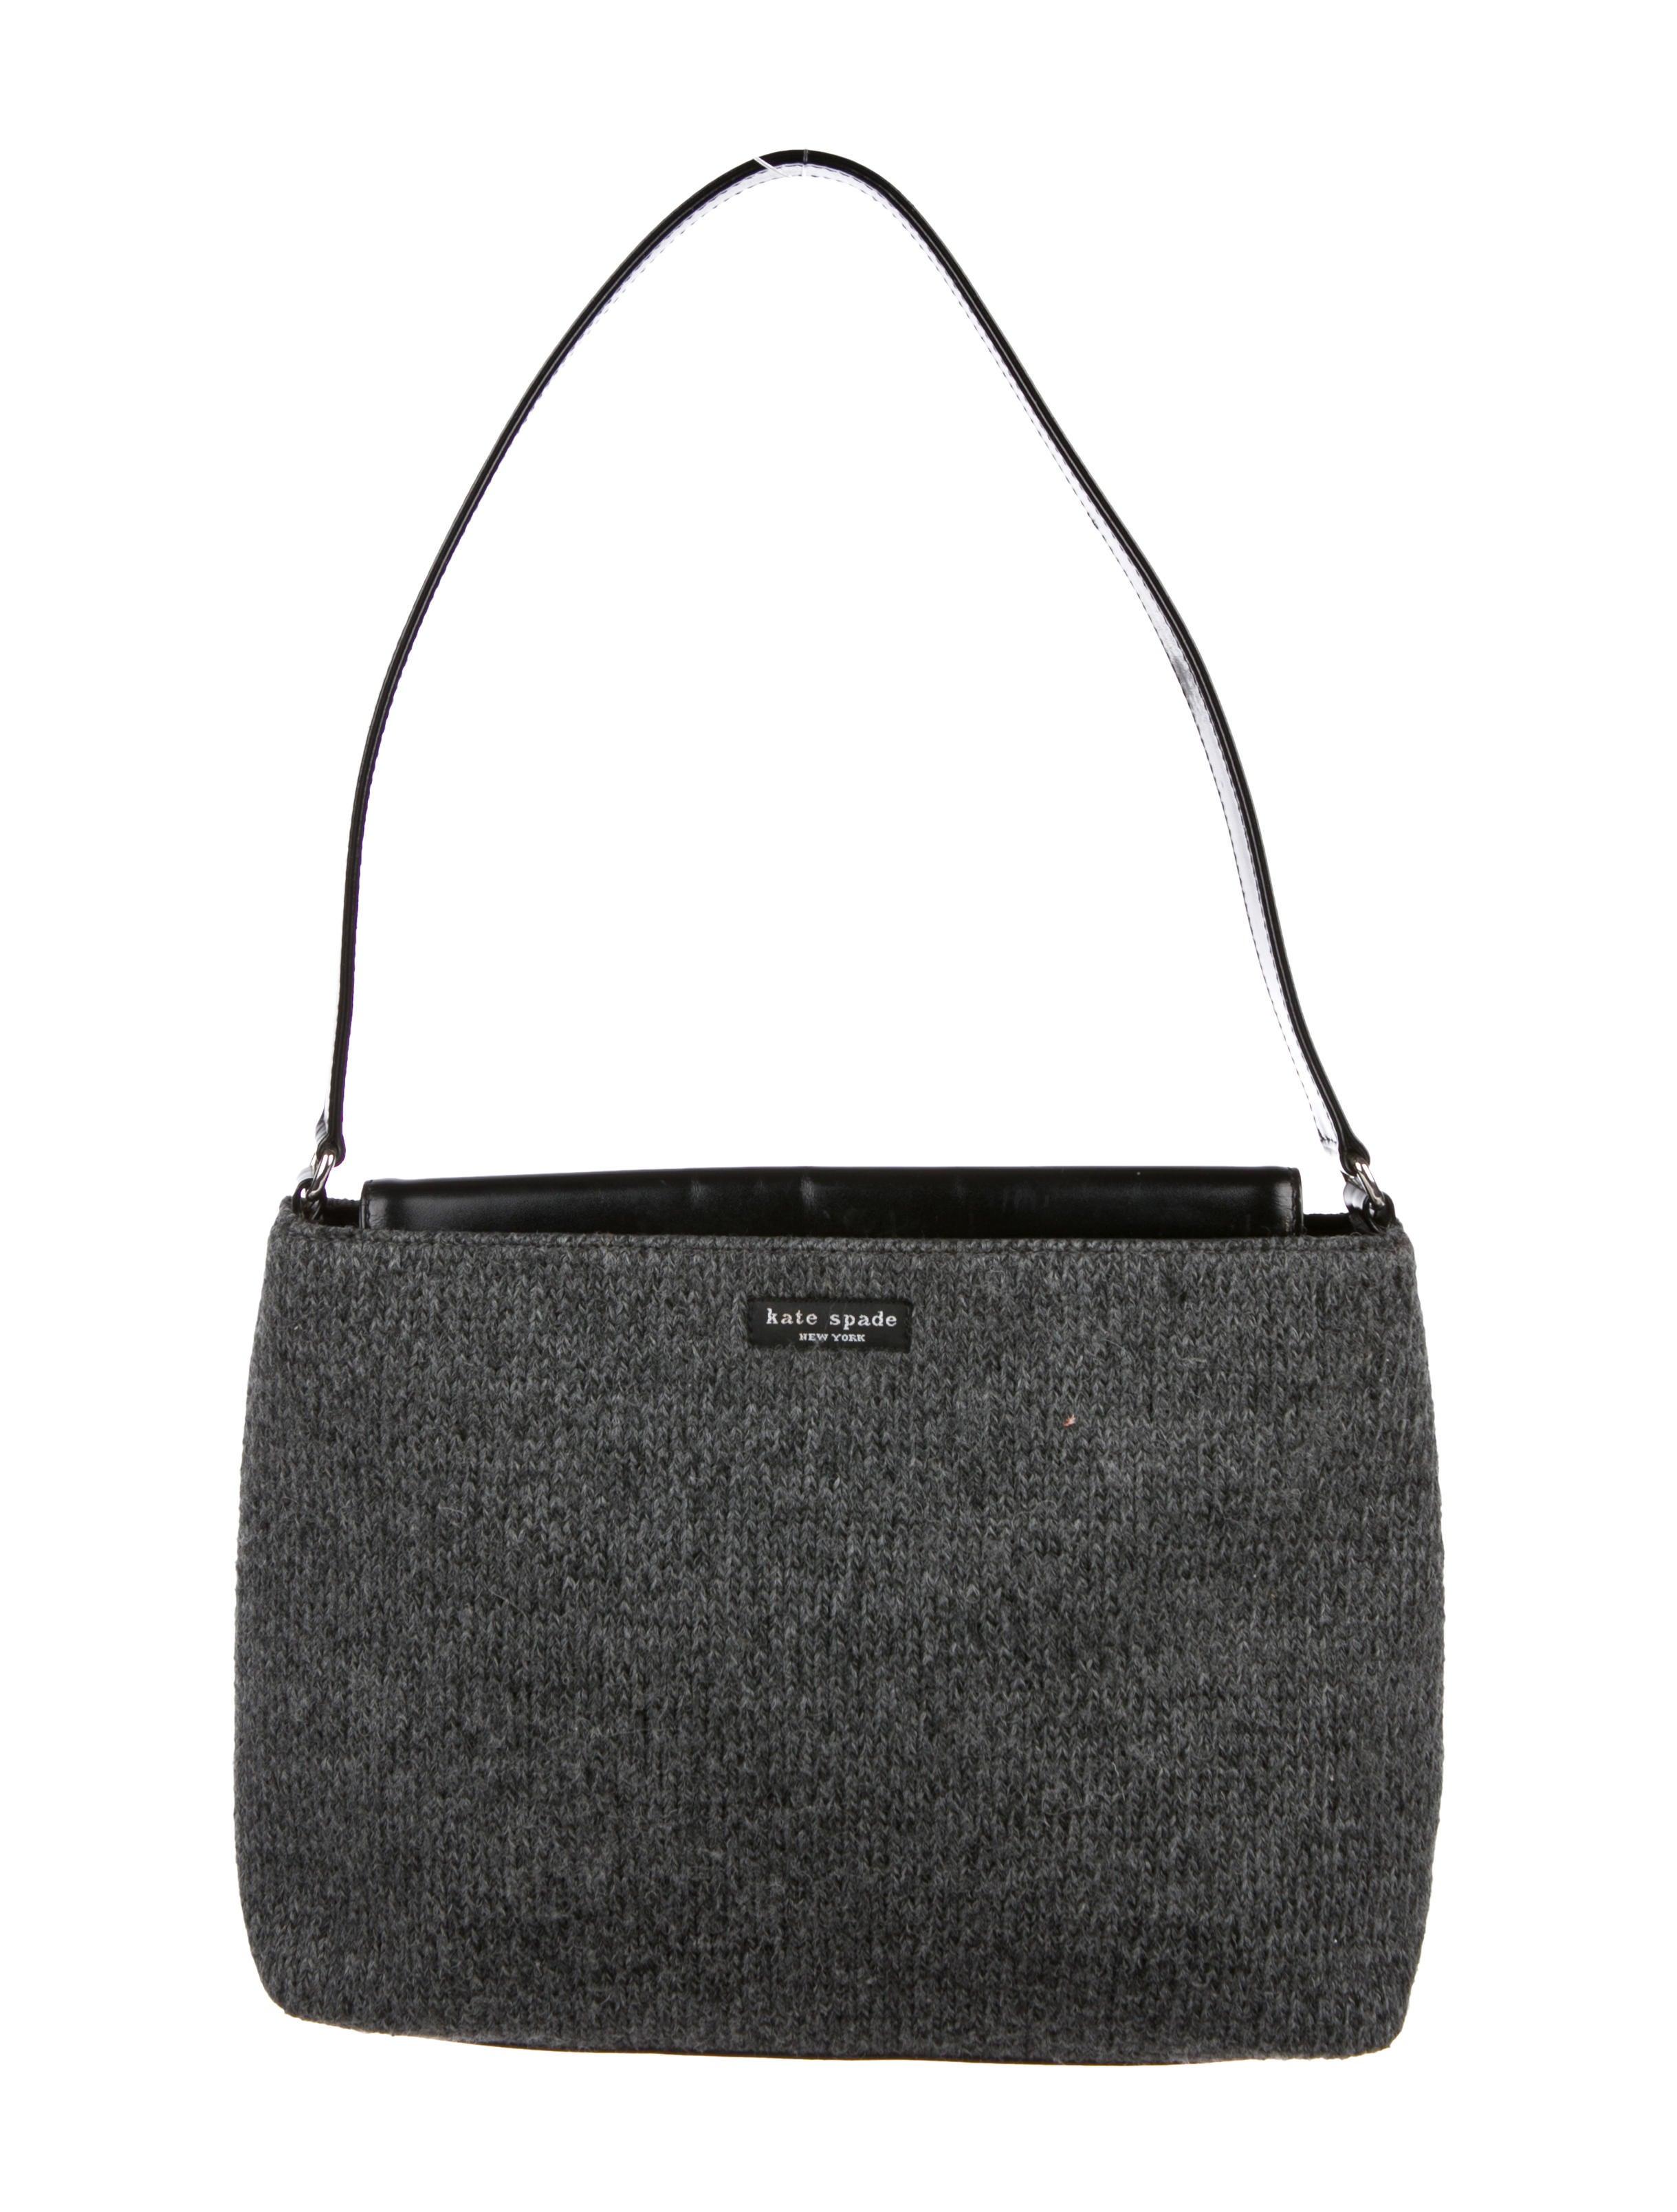 c928120617 Kate Spade Grey Wool Purse - Best Purse Image Ccdbb.Org